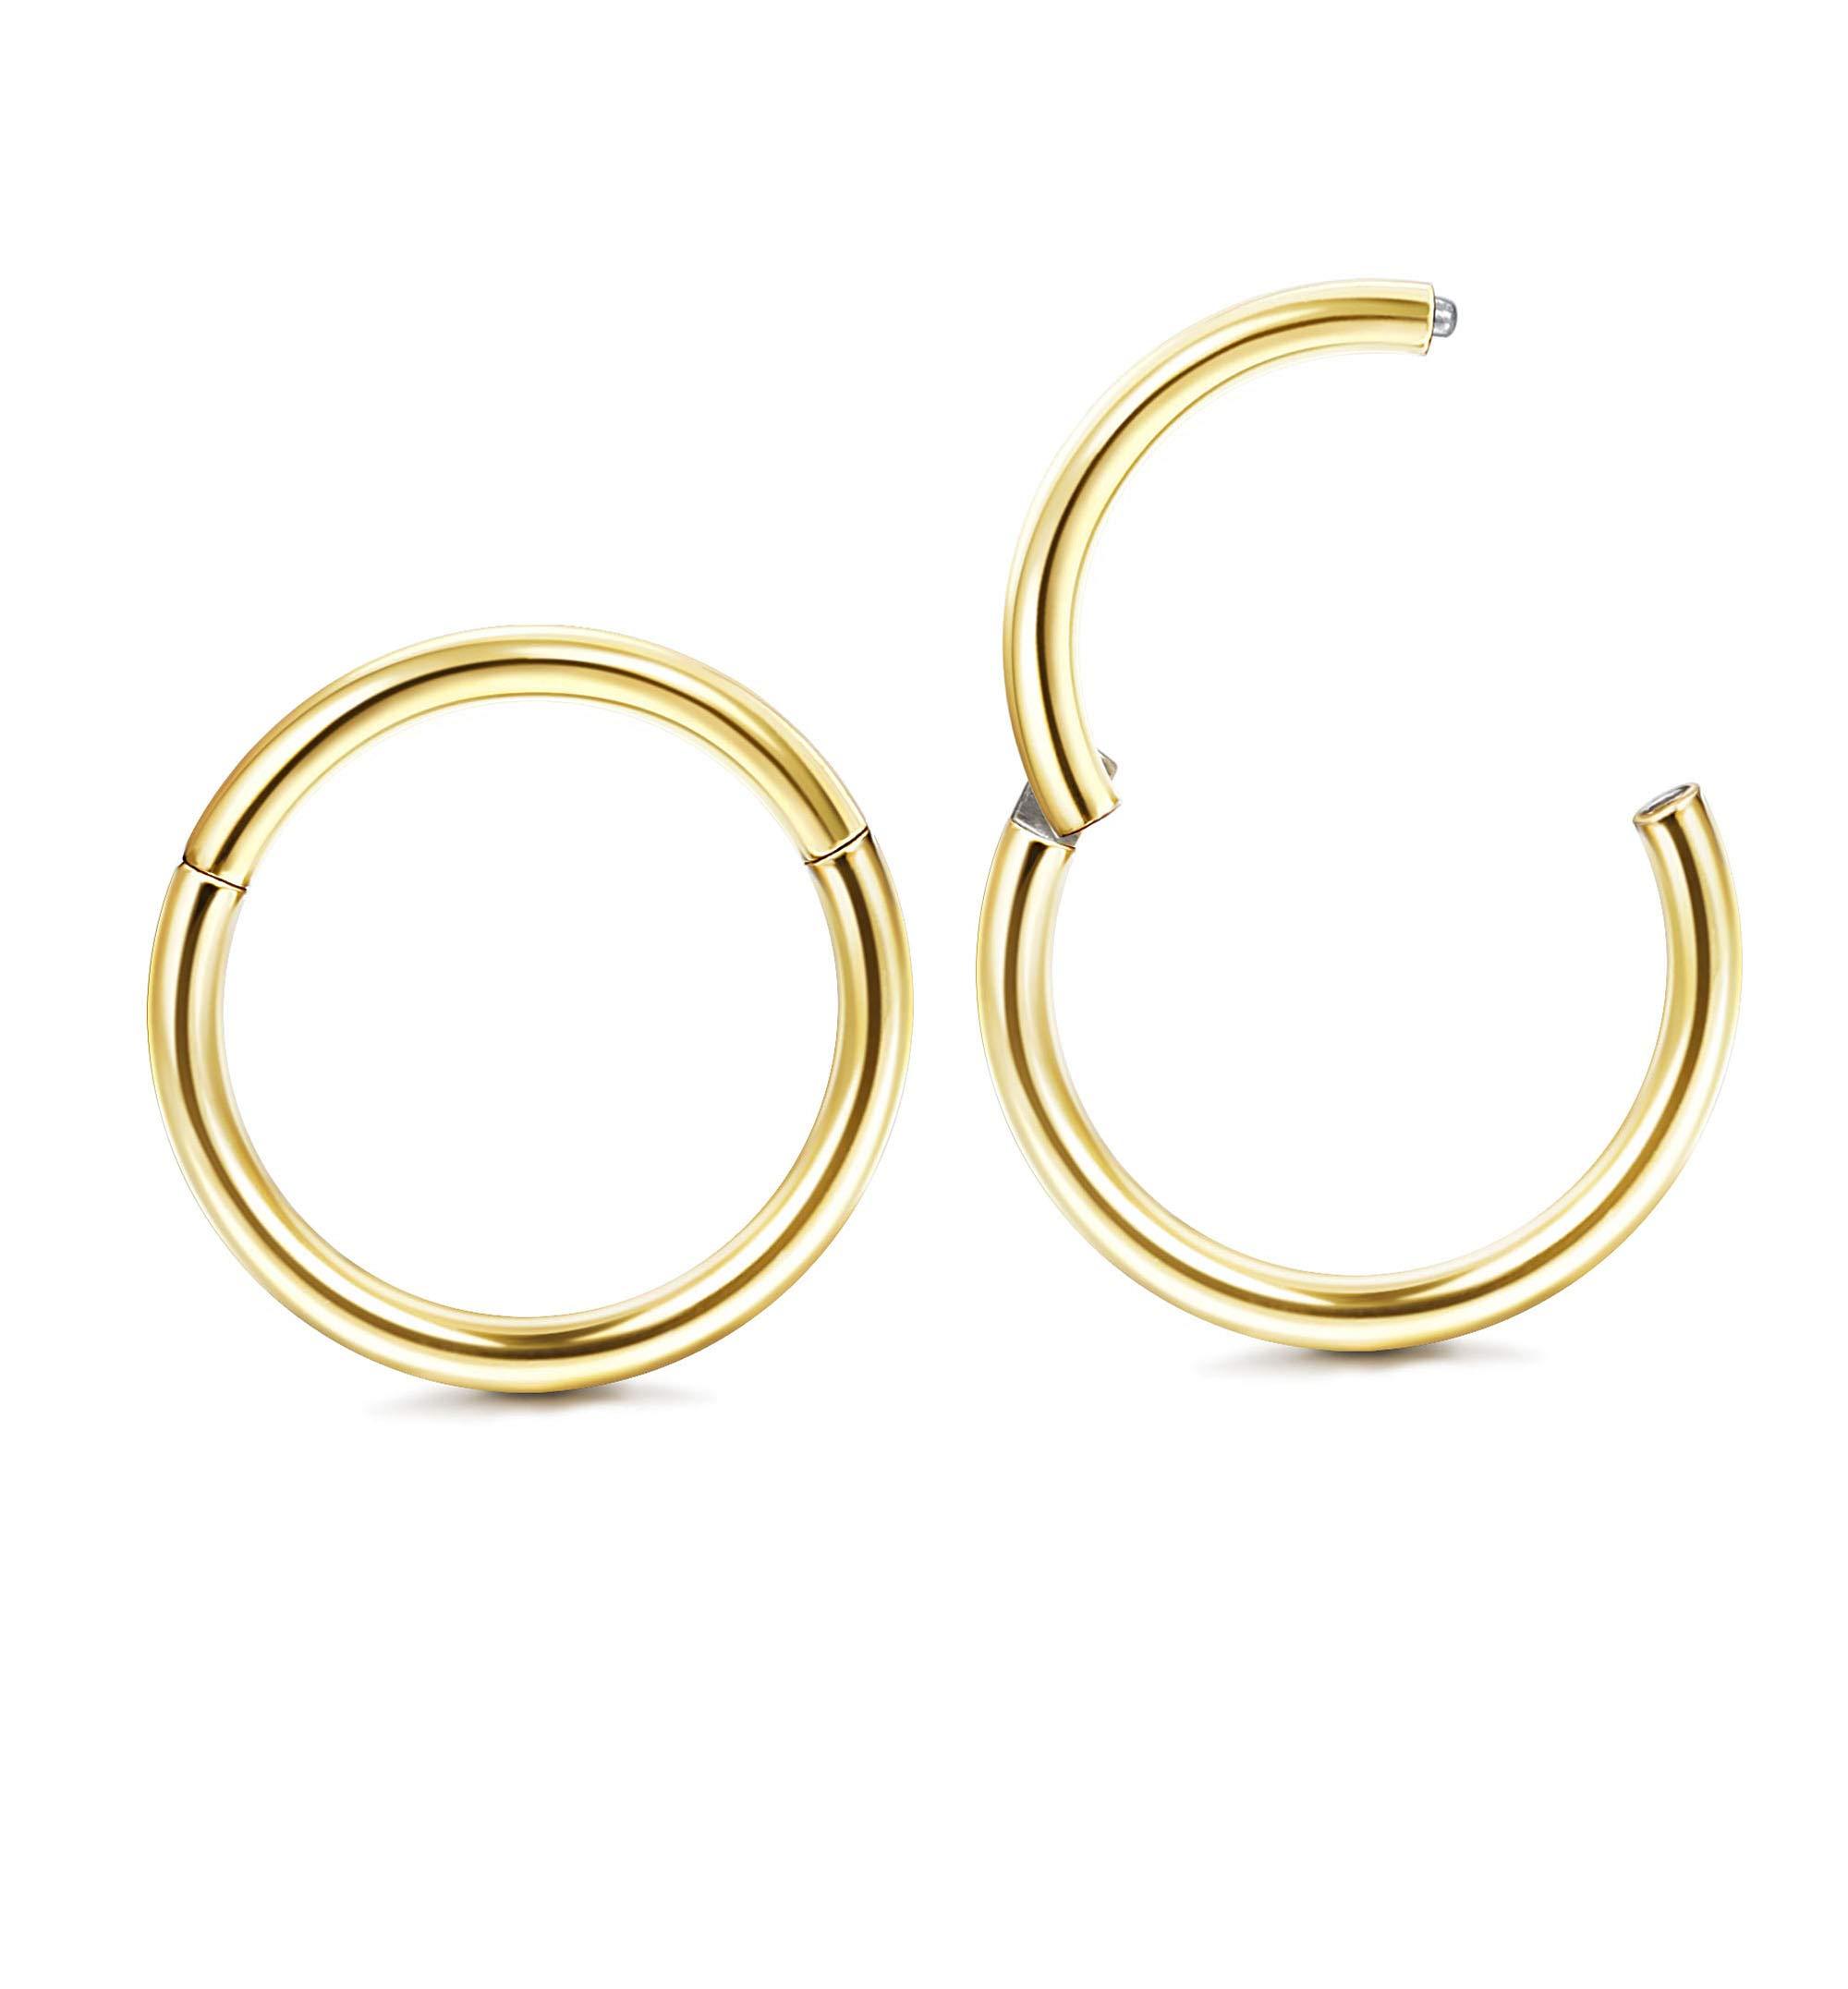 Milacolato 2Pcs G23 Titanium 16-18G Nose Rings Hoop Lip Rings Hinged Segment Rings Helix Daith Tragus Cartilage Earrings Piercing Jewelry